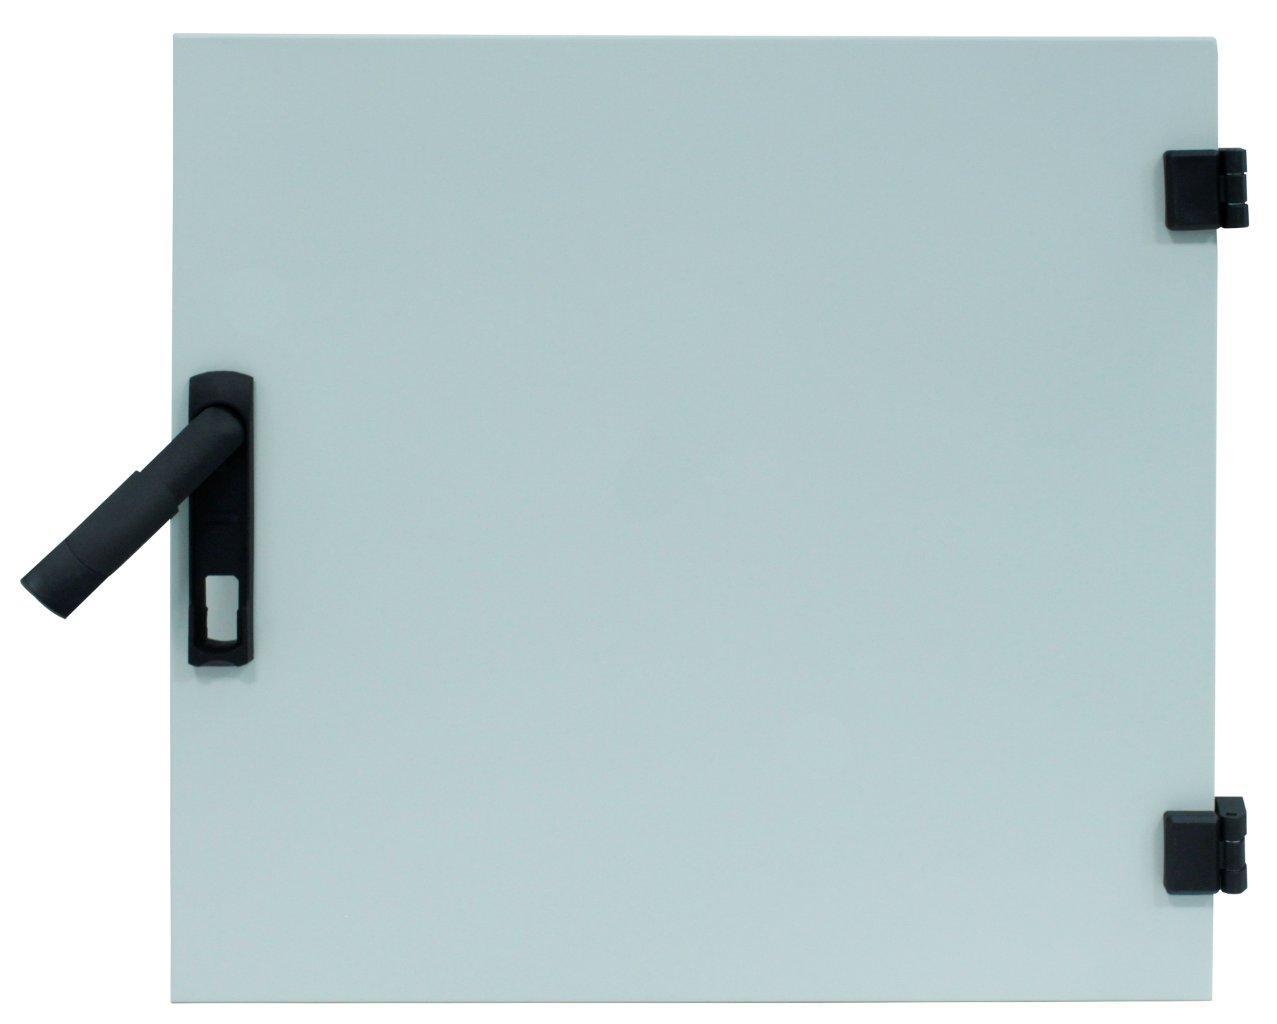 1 Stk Vollmetall-Tür f.DW-Schrank 9HE,B600,RAL7035,HZ-Vorbereitung DWRT0966--